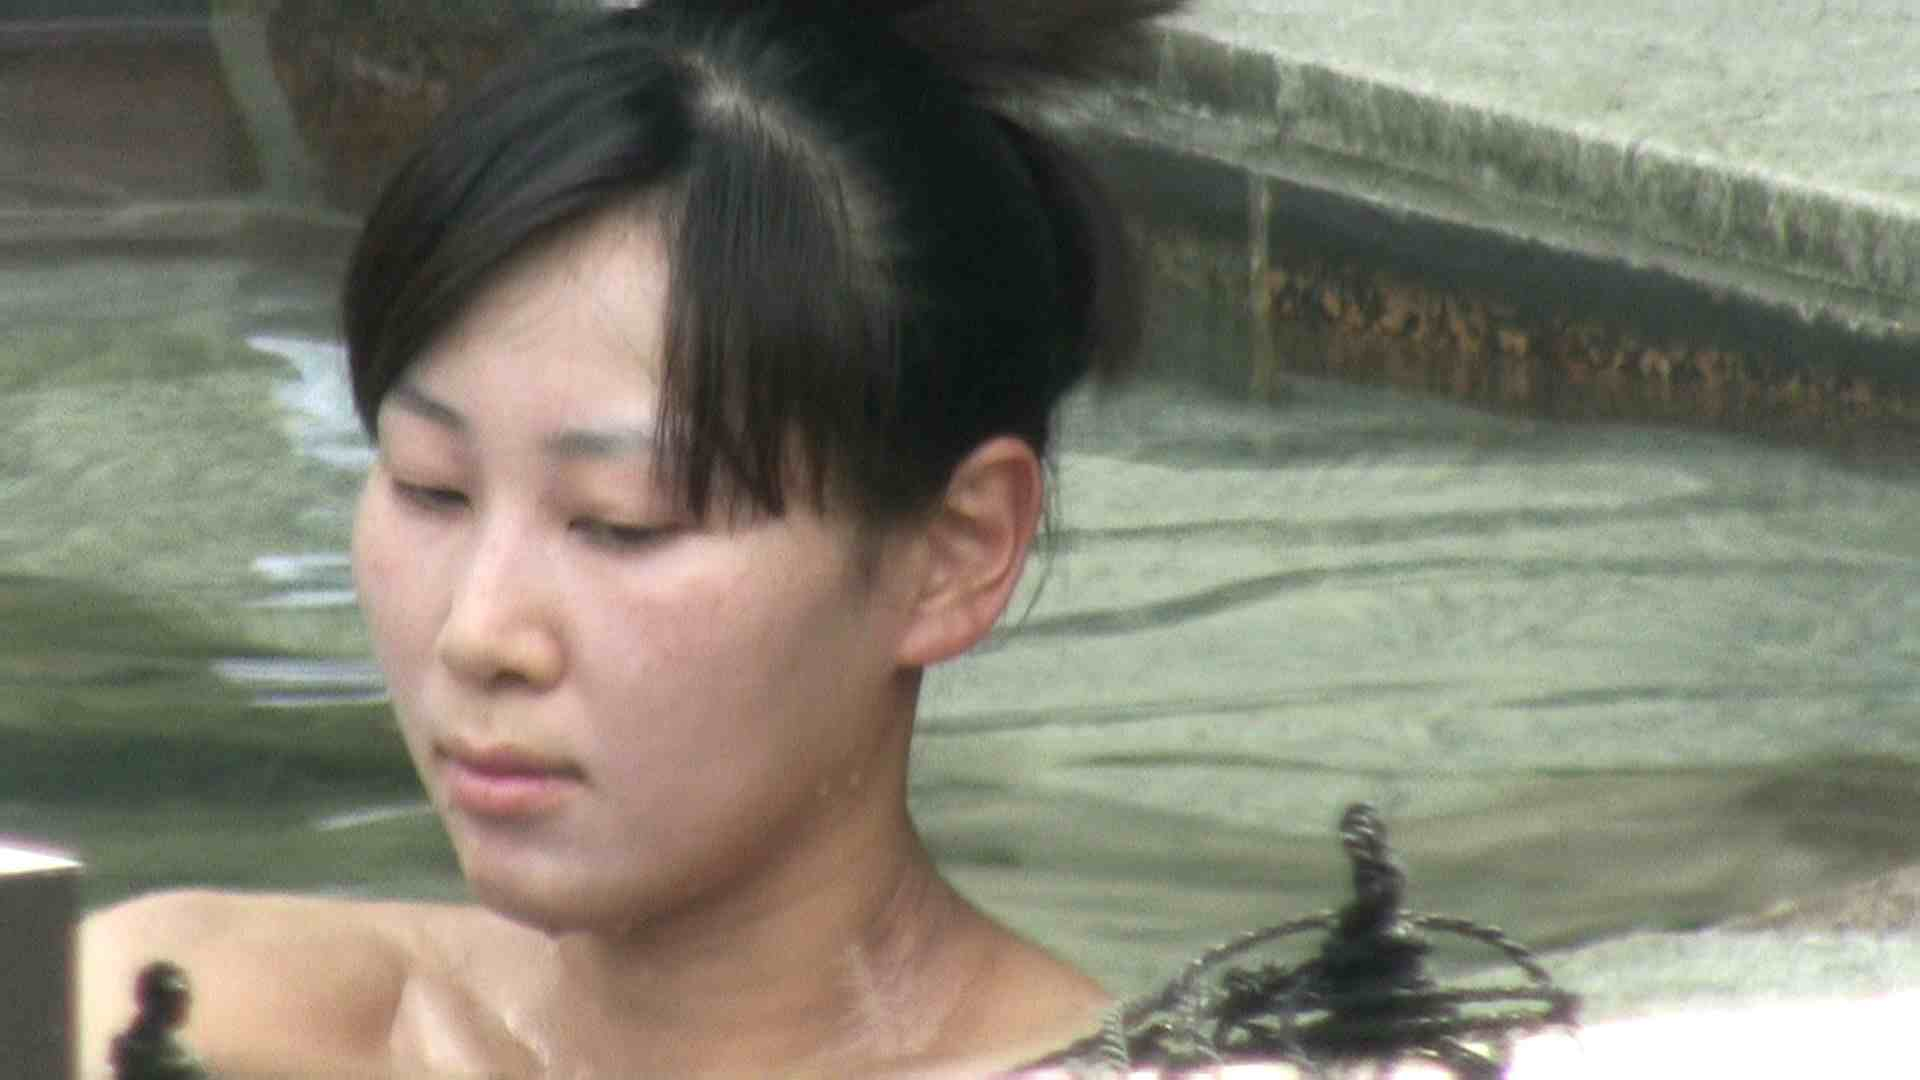 Aquaな露天風呂Vol.665 HなOL   盗撮  104pic 8